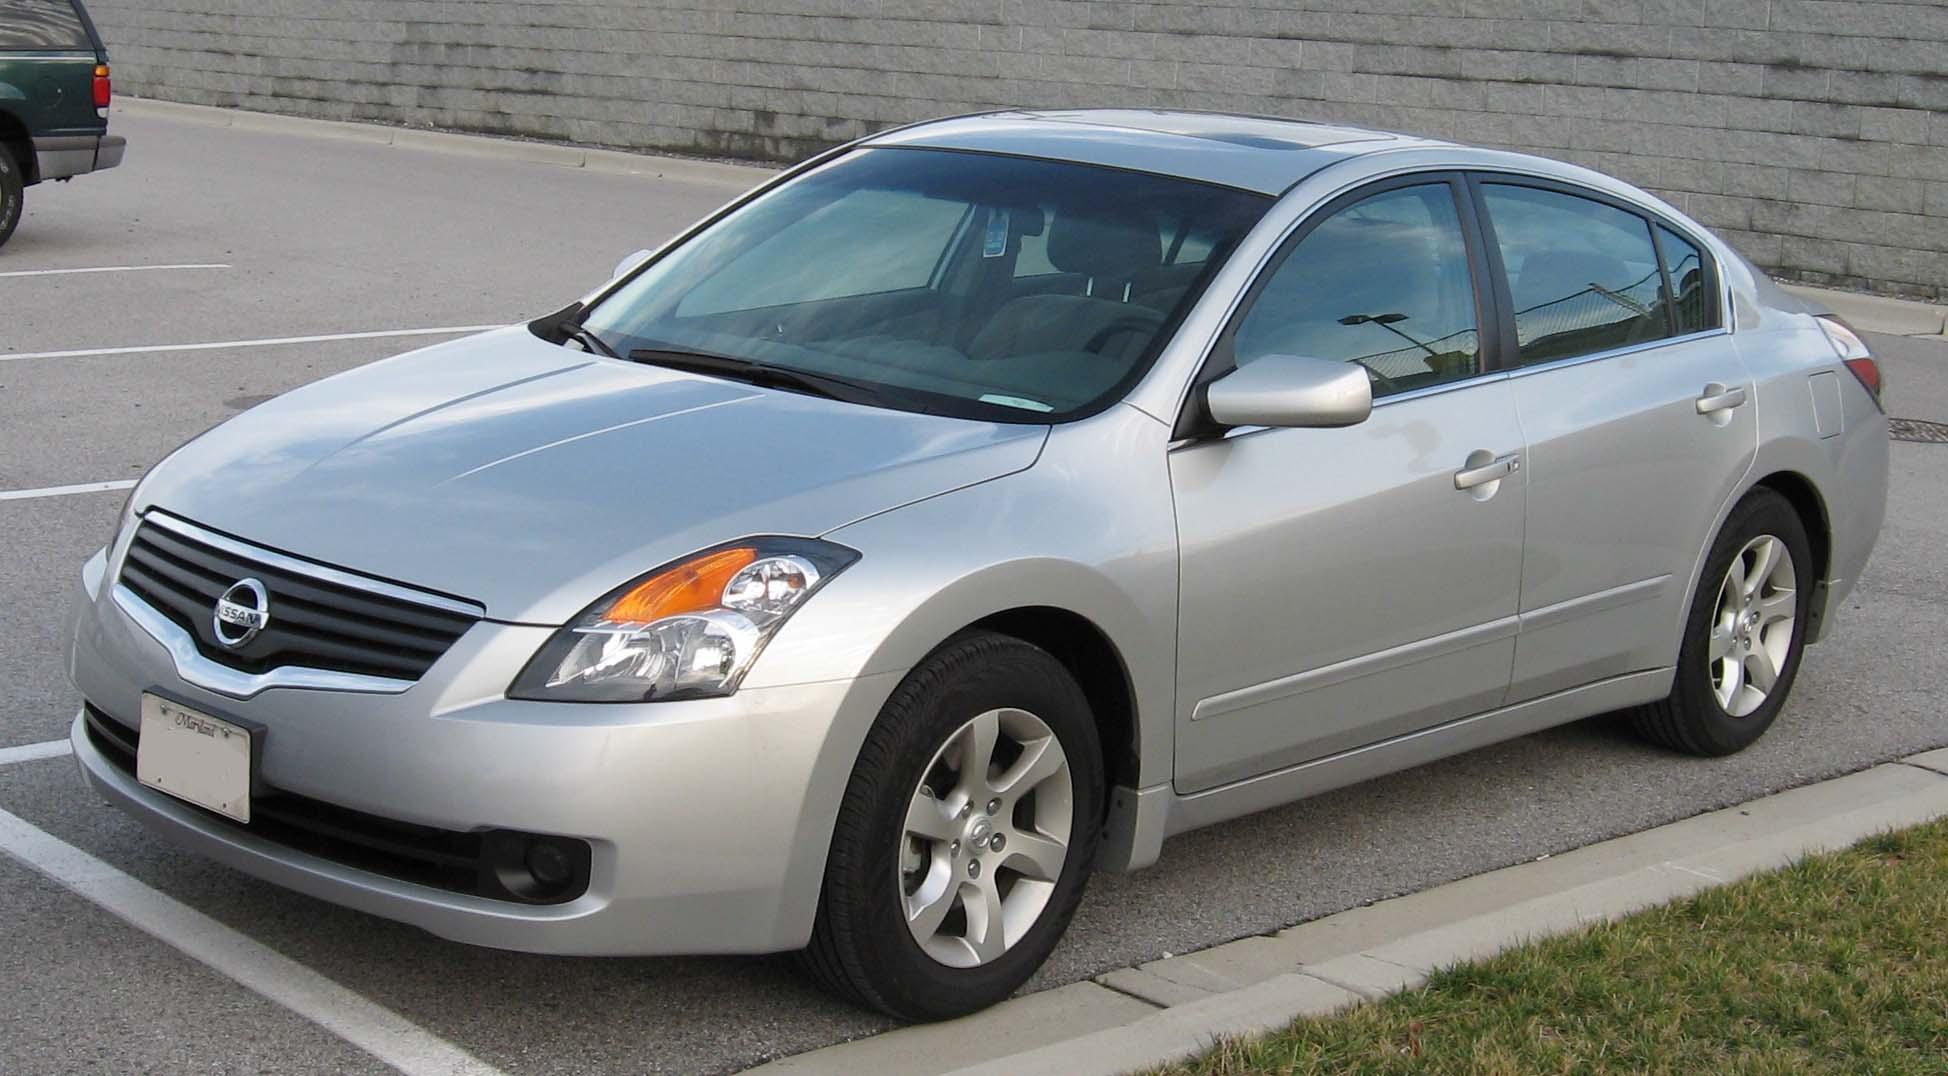 2007 nissan altima pic | Nissan Auto Cars